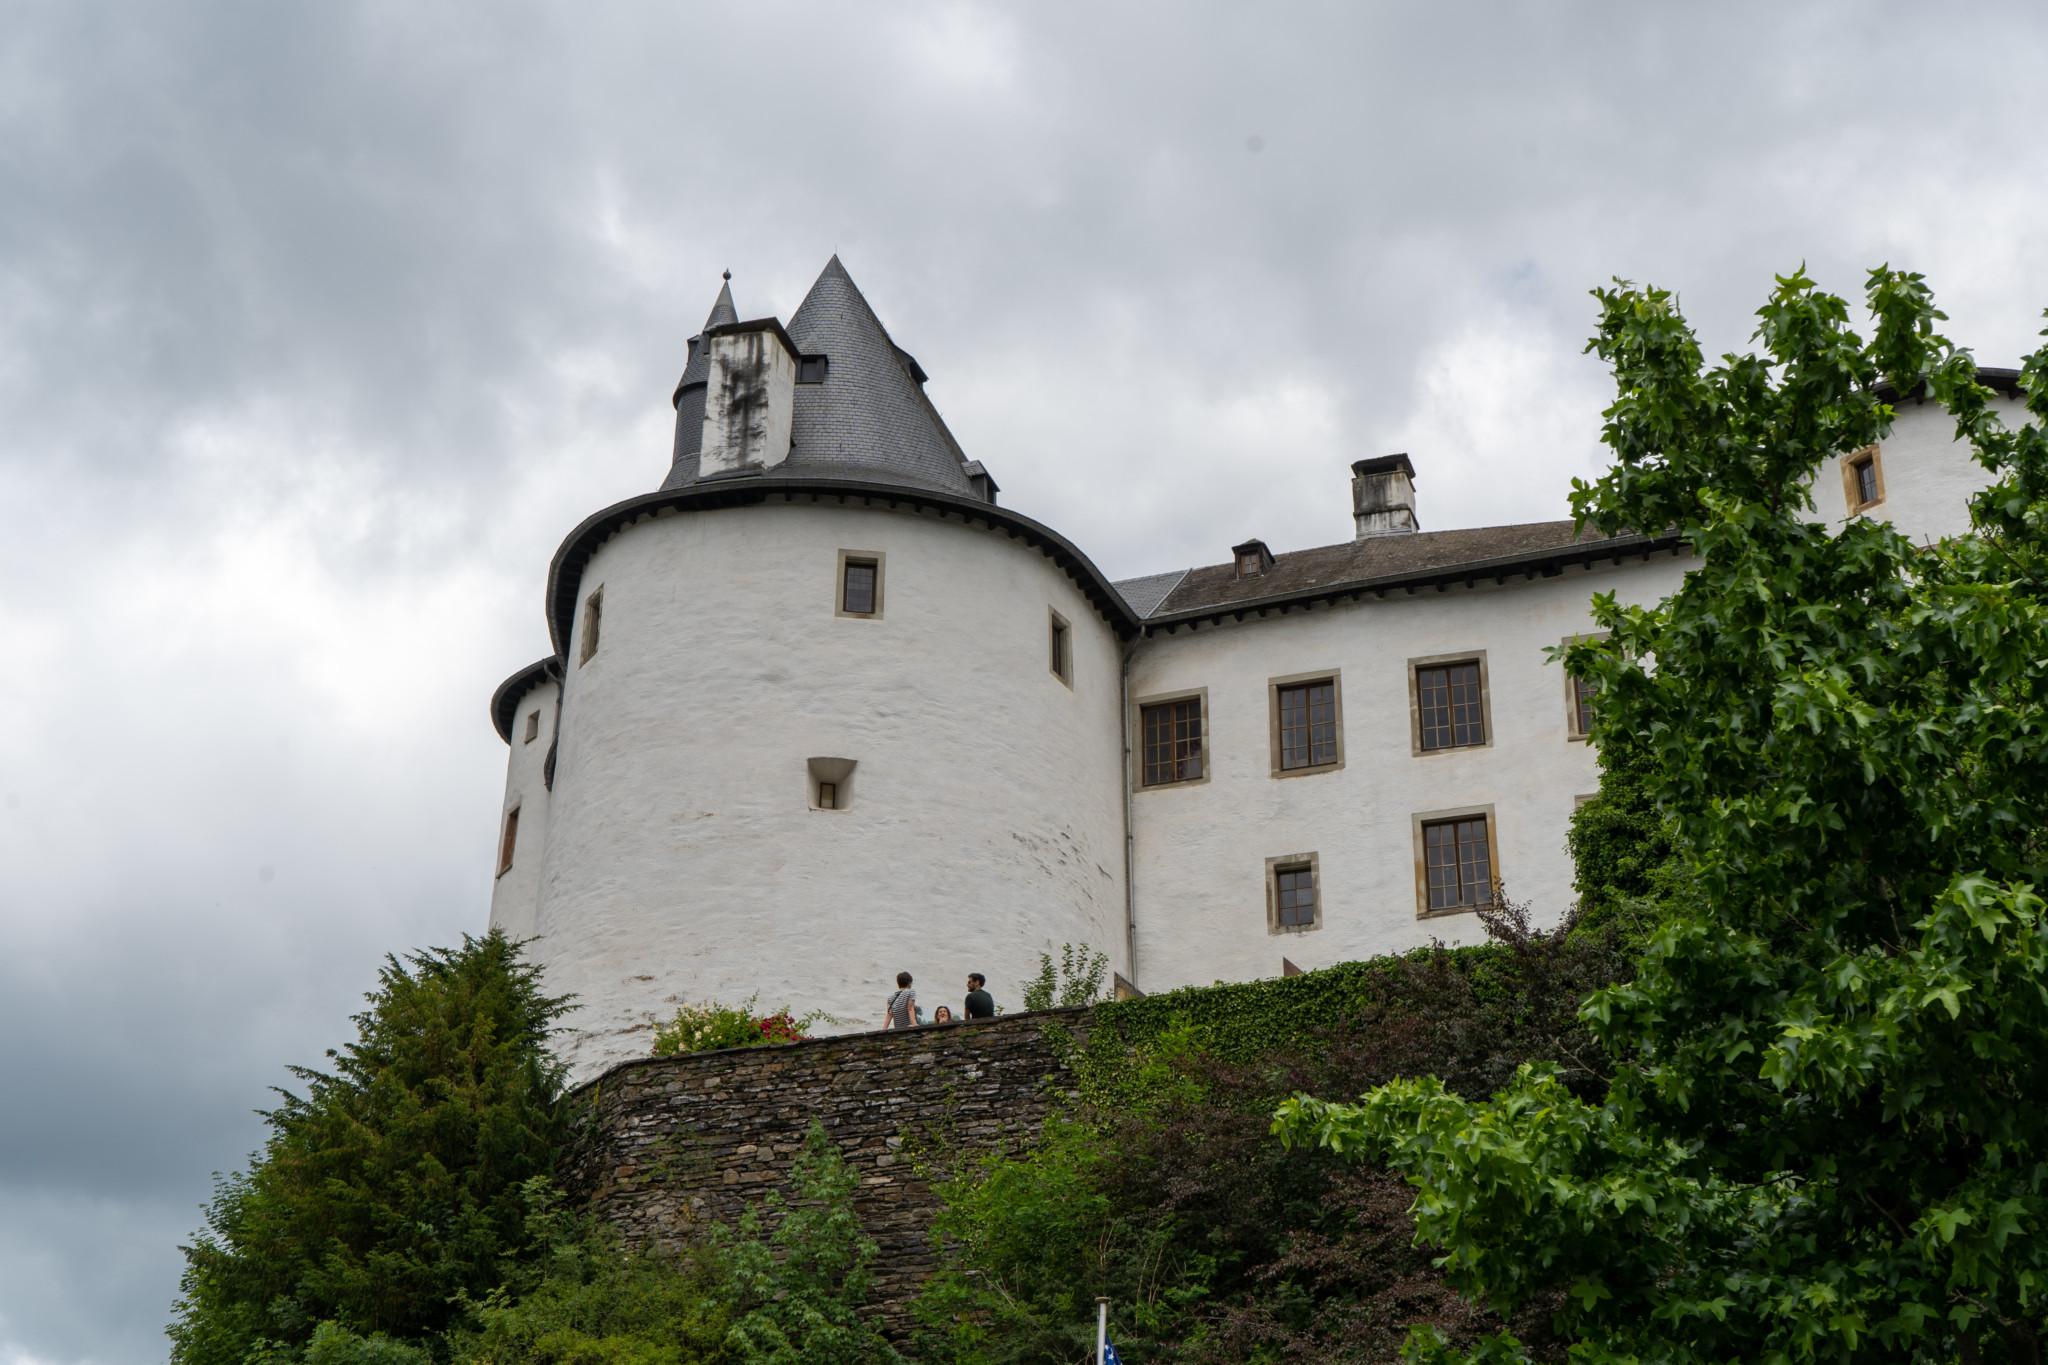 Schloss Cervaux in Luxemburg